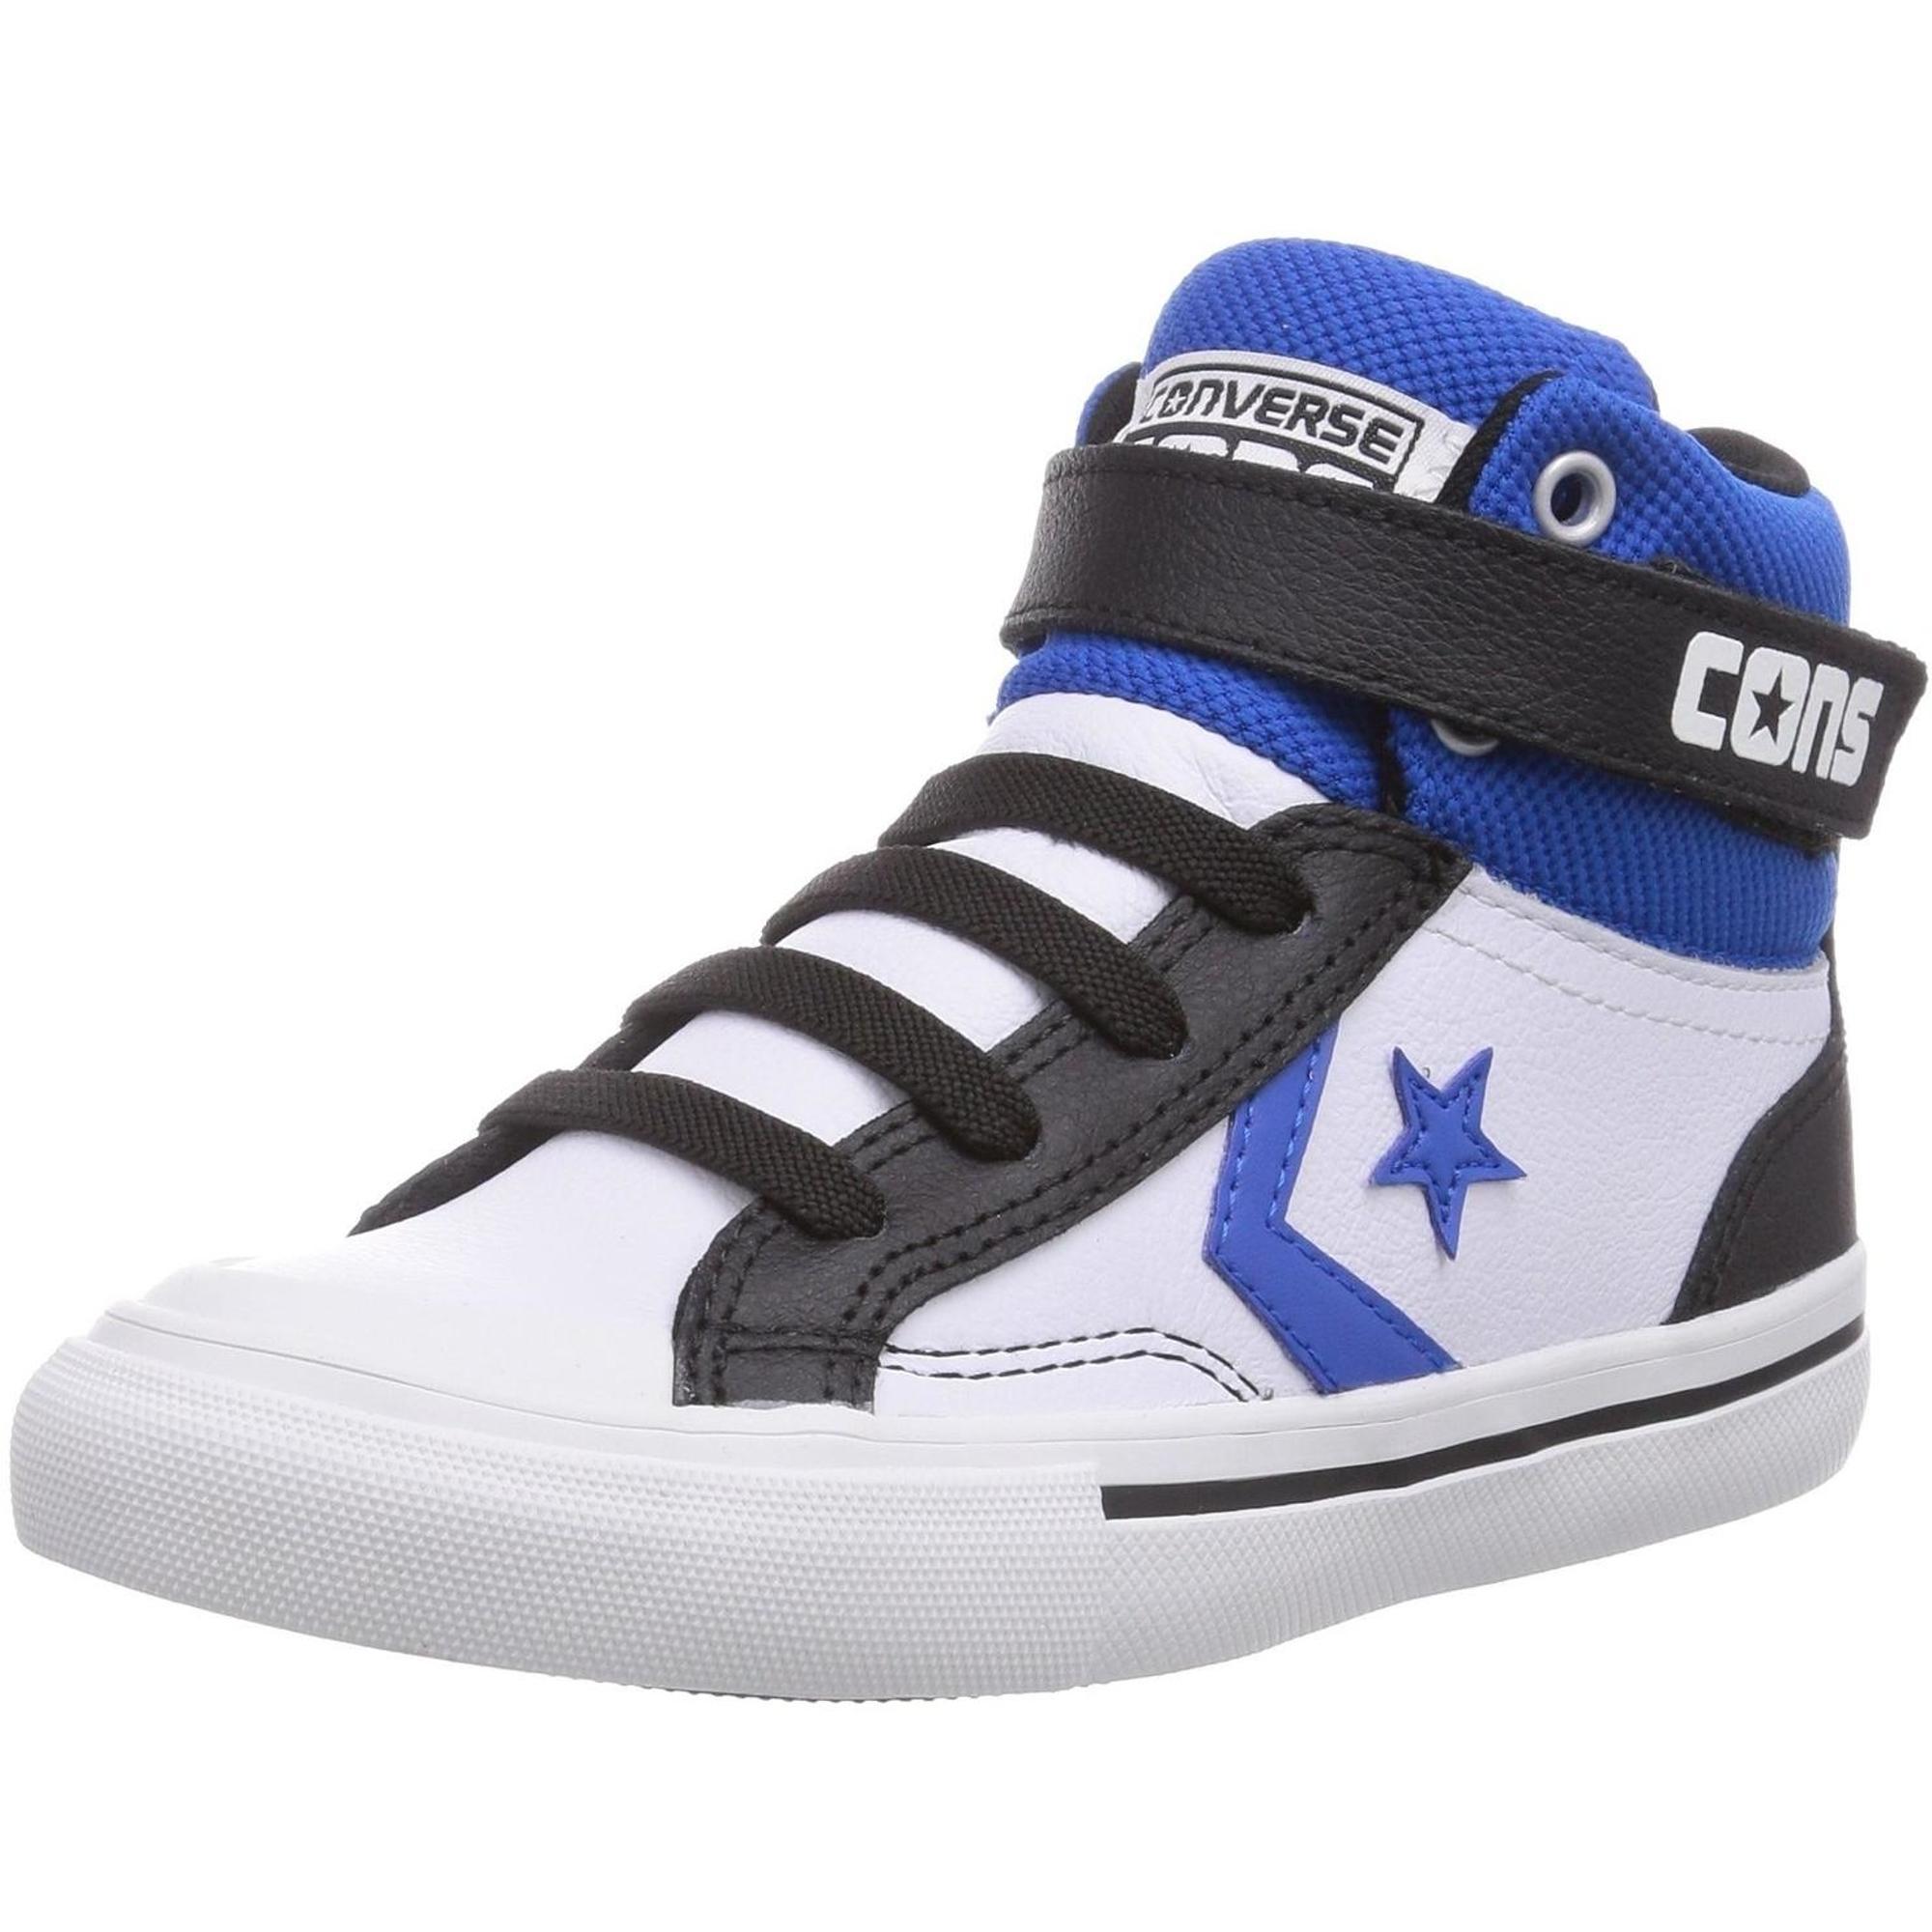 Converse Cons Pro Blaze Strap Stretch Weiß Leder Jugend